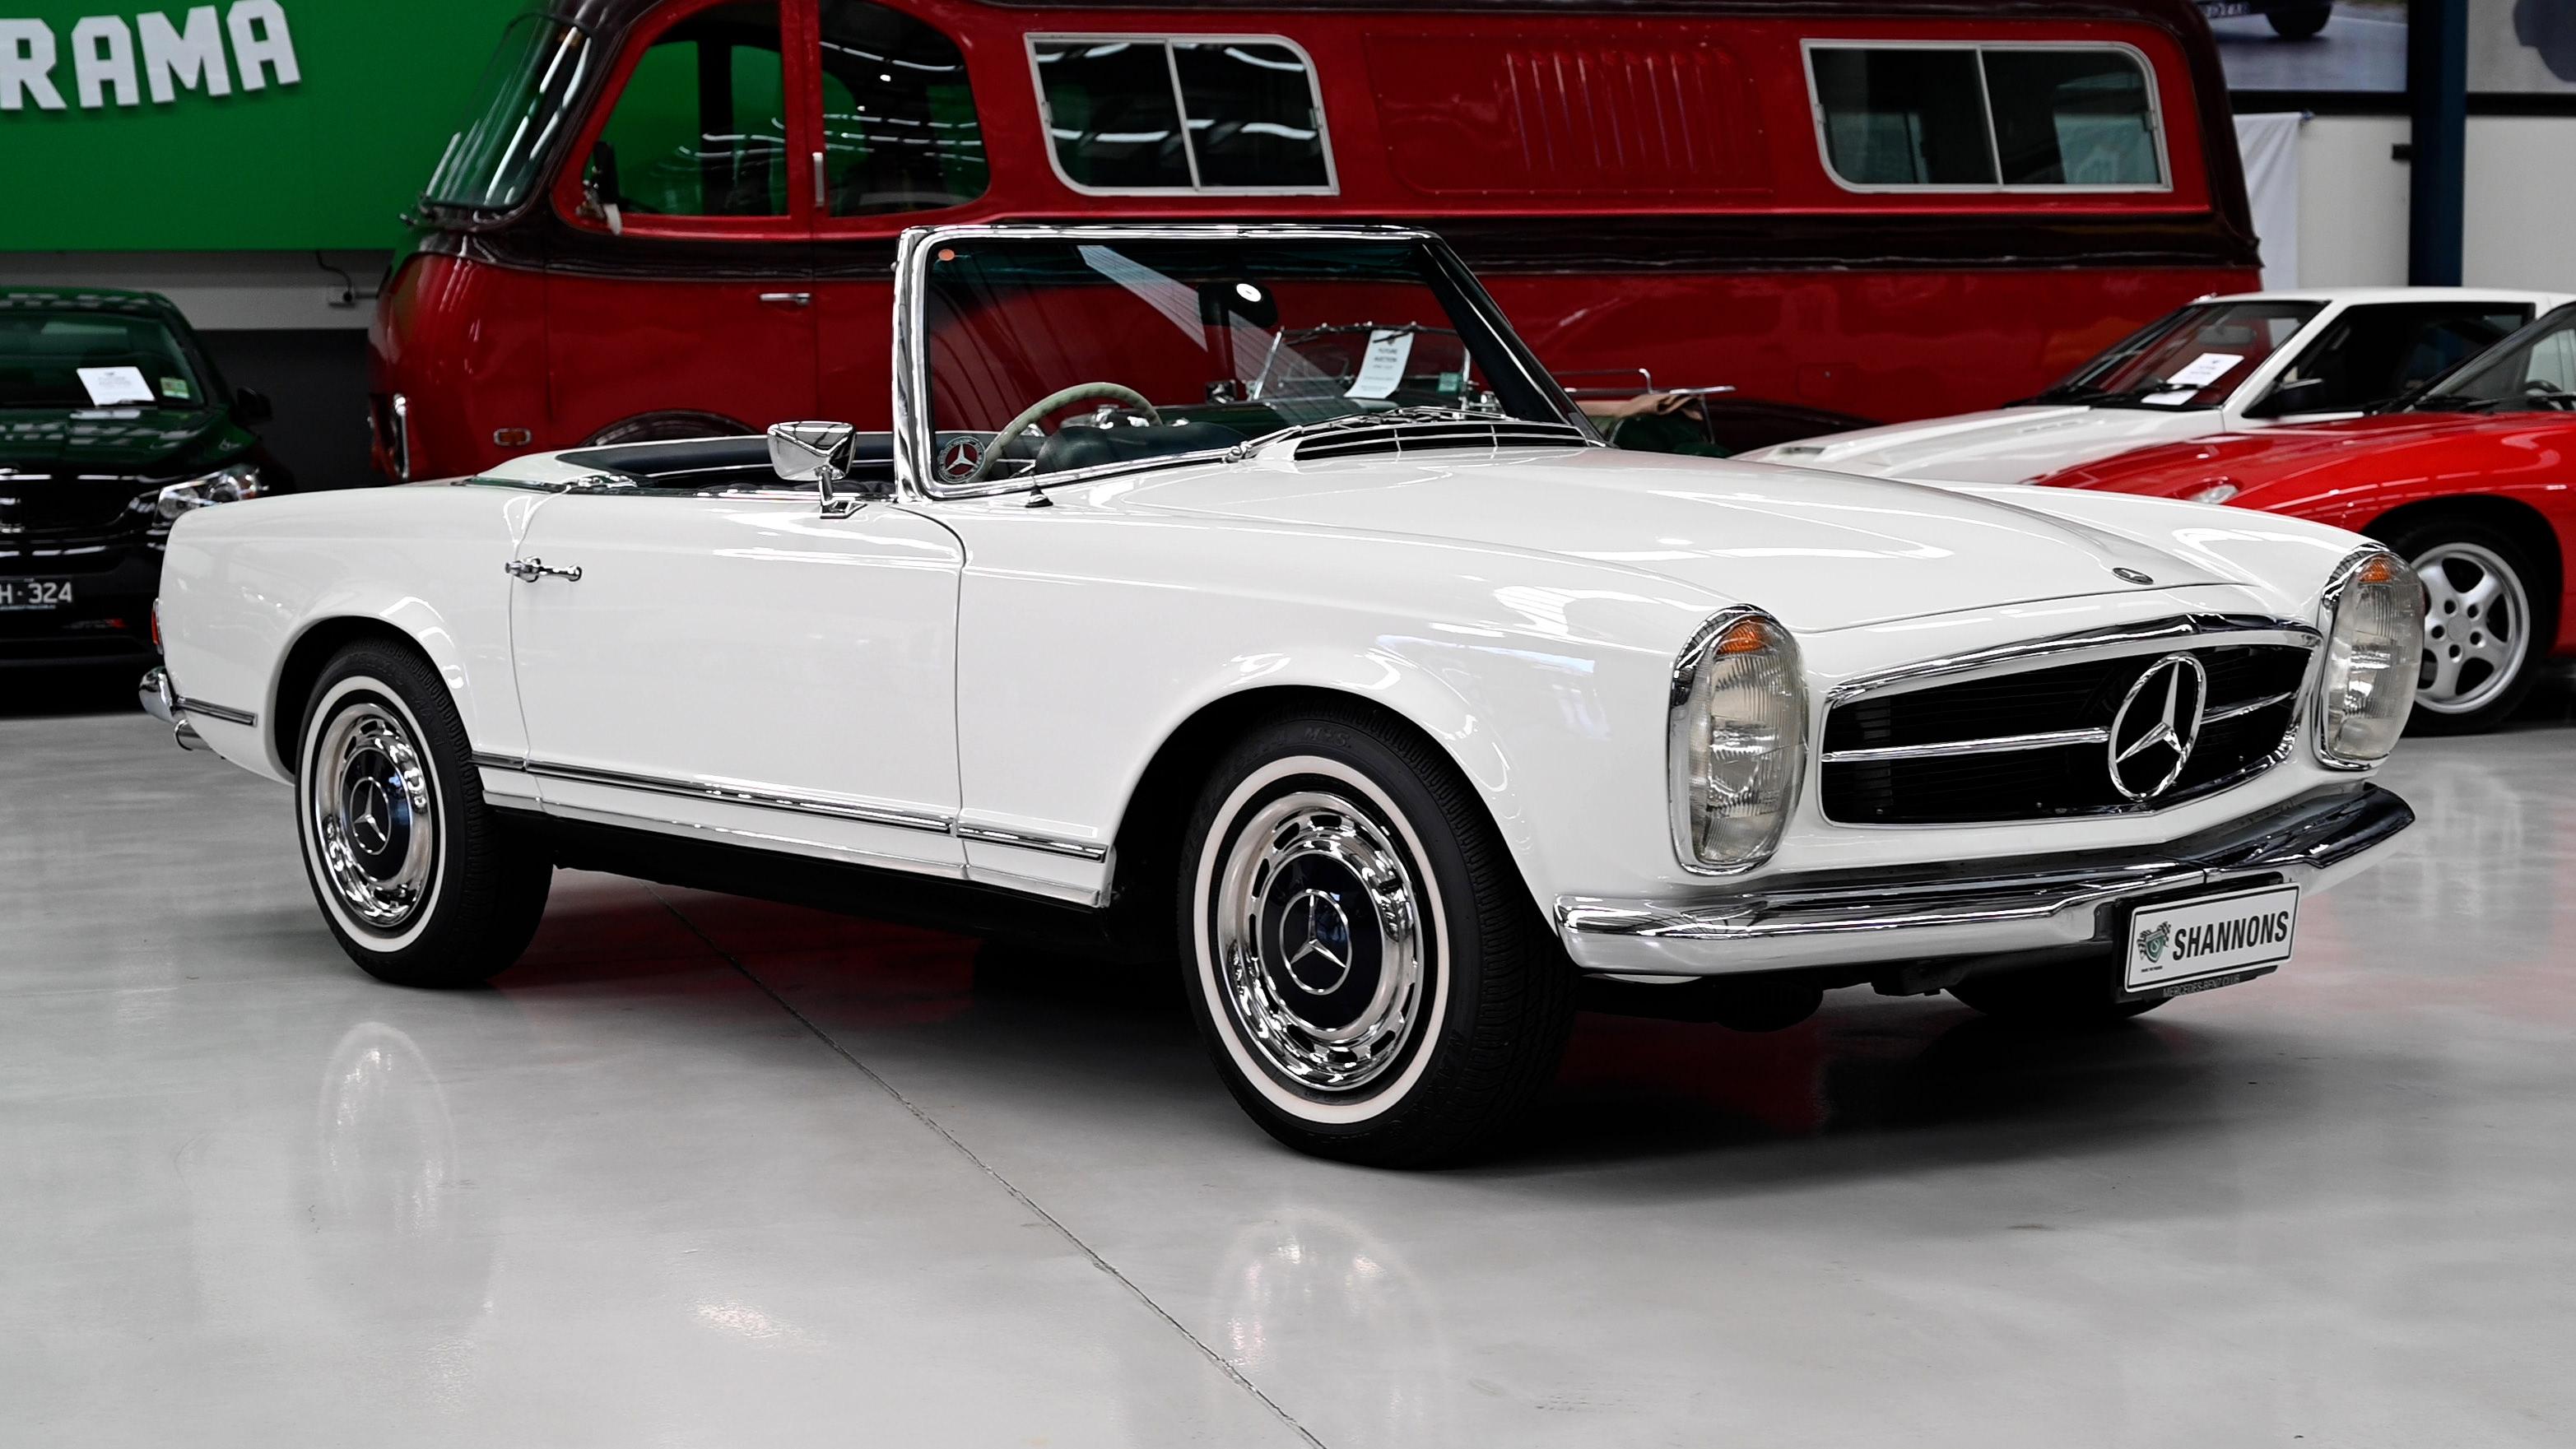 1970 Mercedes-Benz 280SL Convertible - 2021 Shannons Autumn Timed Online Auction